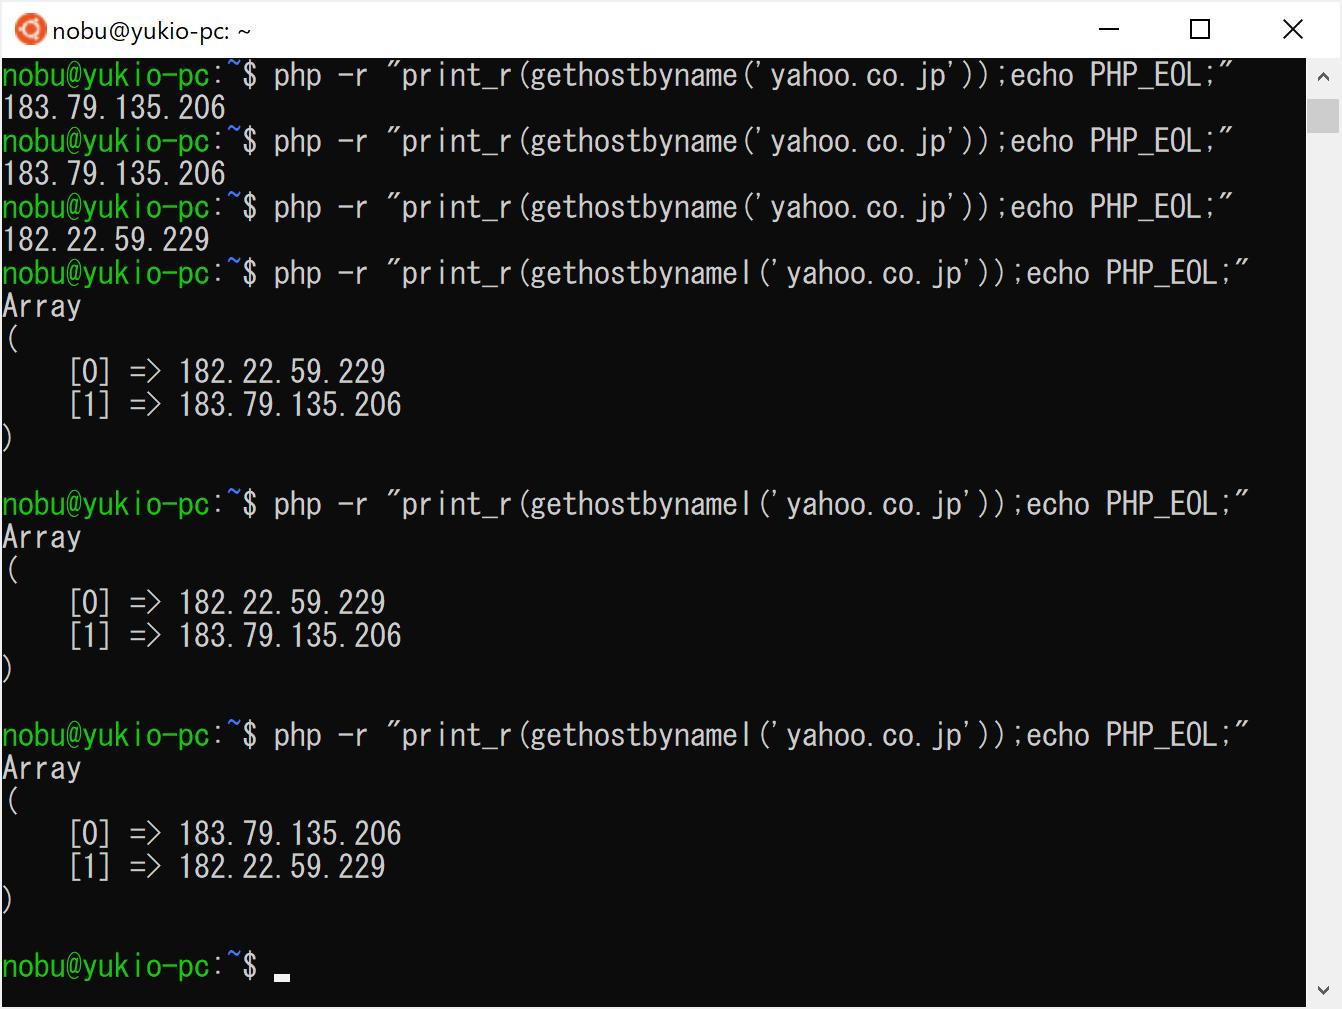 PHP関数のgethostbynameとgethostbynamelで「yahoo.co.jp」を実行した結果